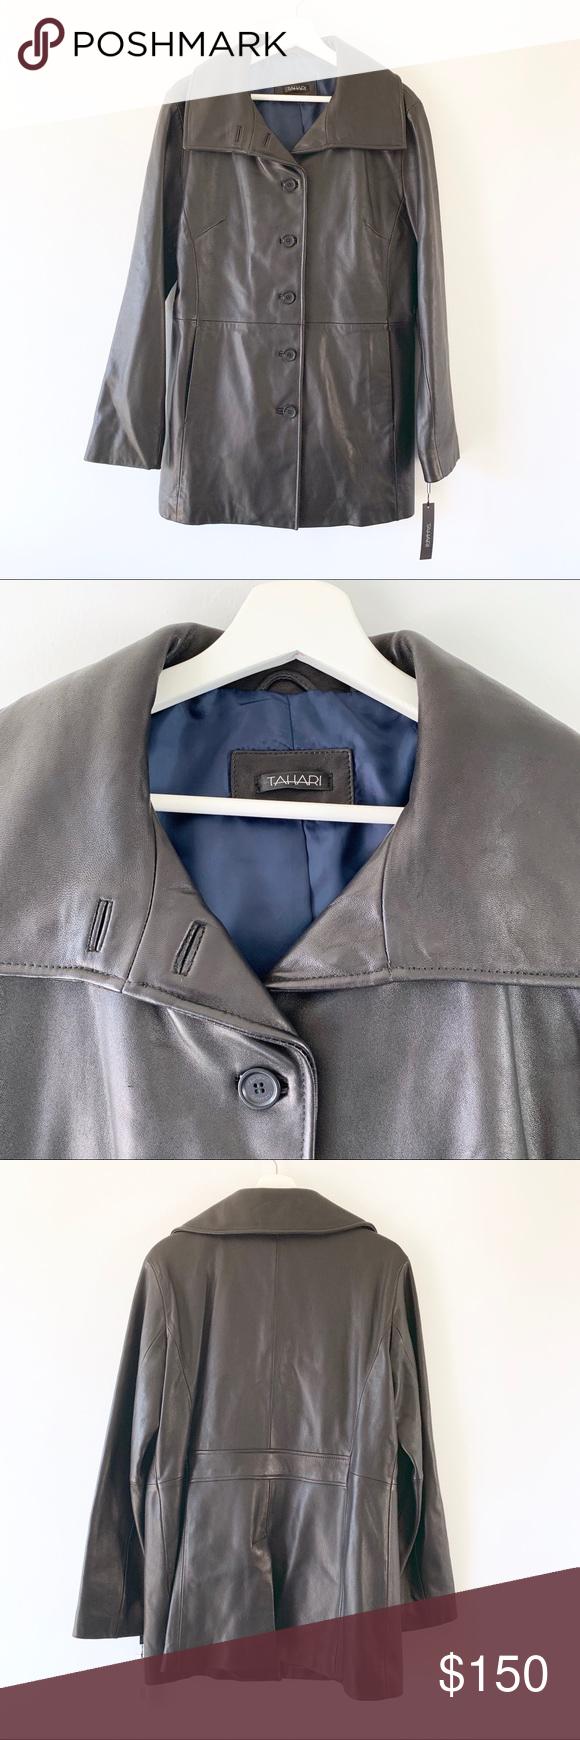 Tahari Black Leather Pea Coat Jacket Nwt Size Large Tahari Black Leather Jacket Fitted Silhouette Side Pockets Lo Peacoat Jacket Coats Jackets Women Fashion [ 1740 x 580 Pixel ]